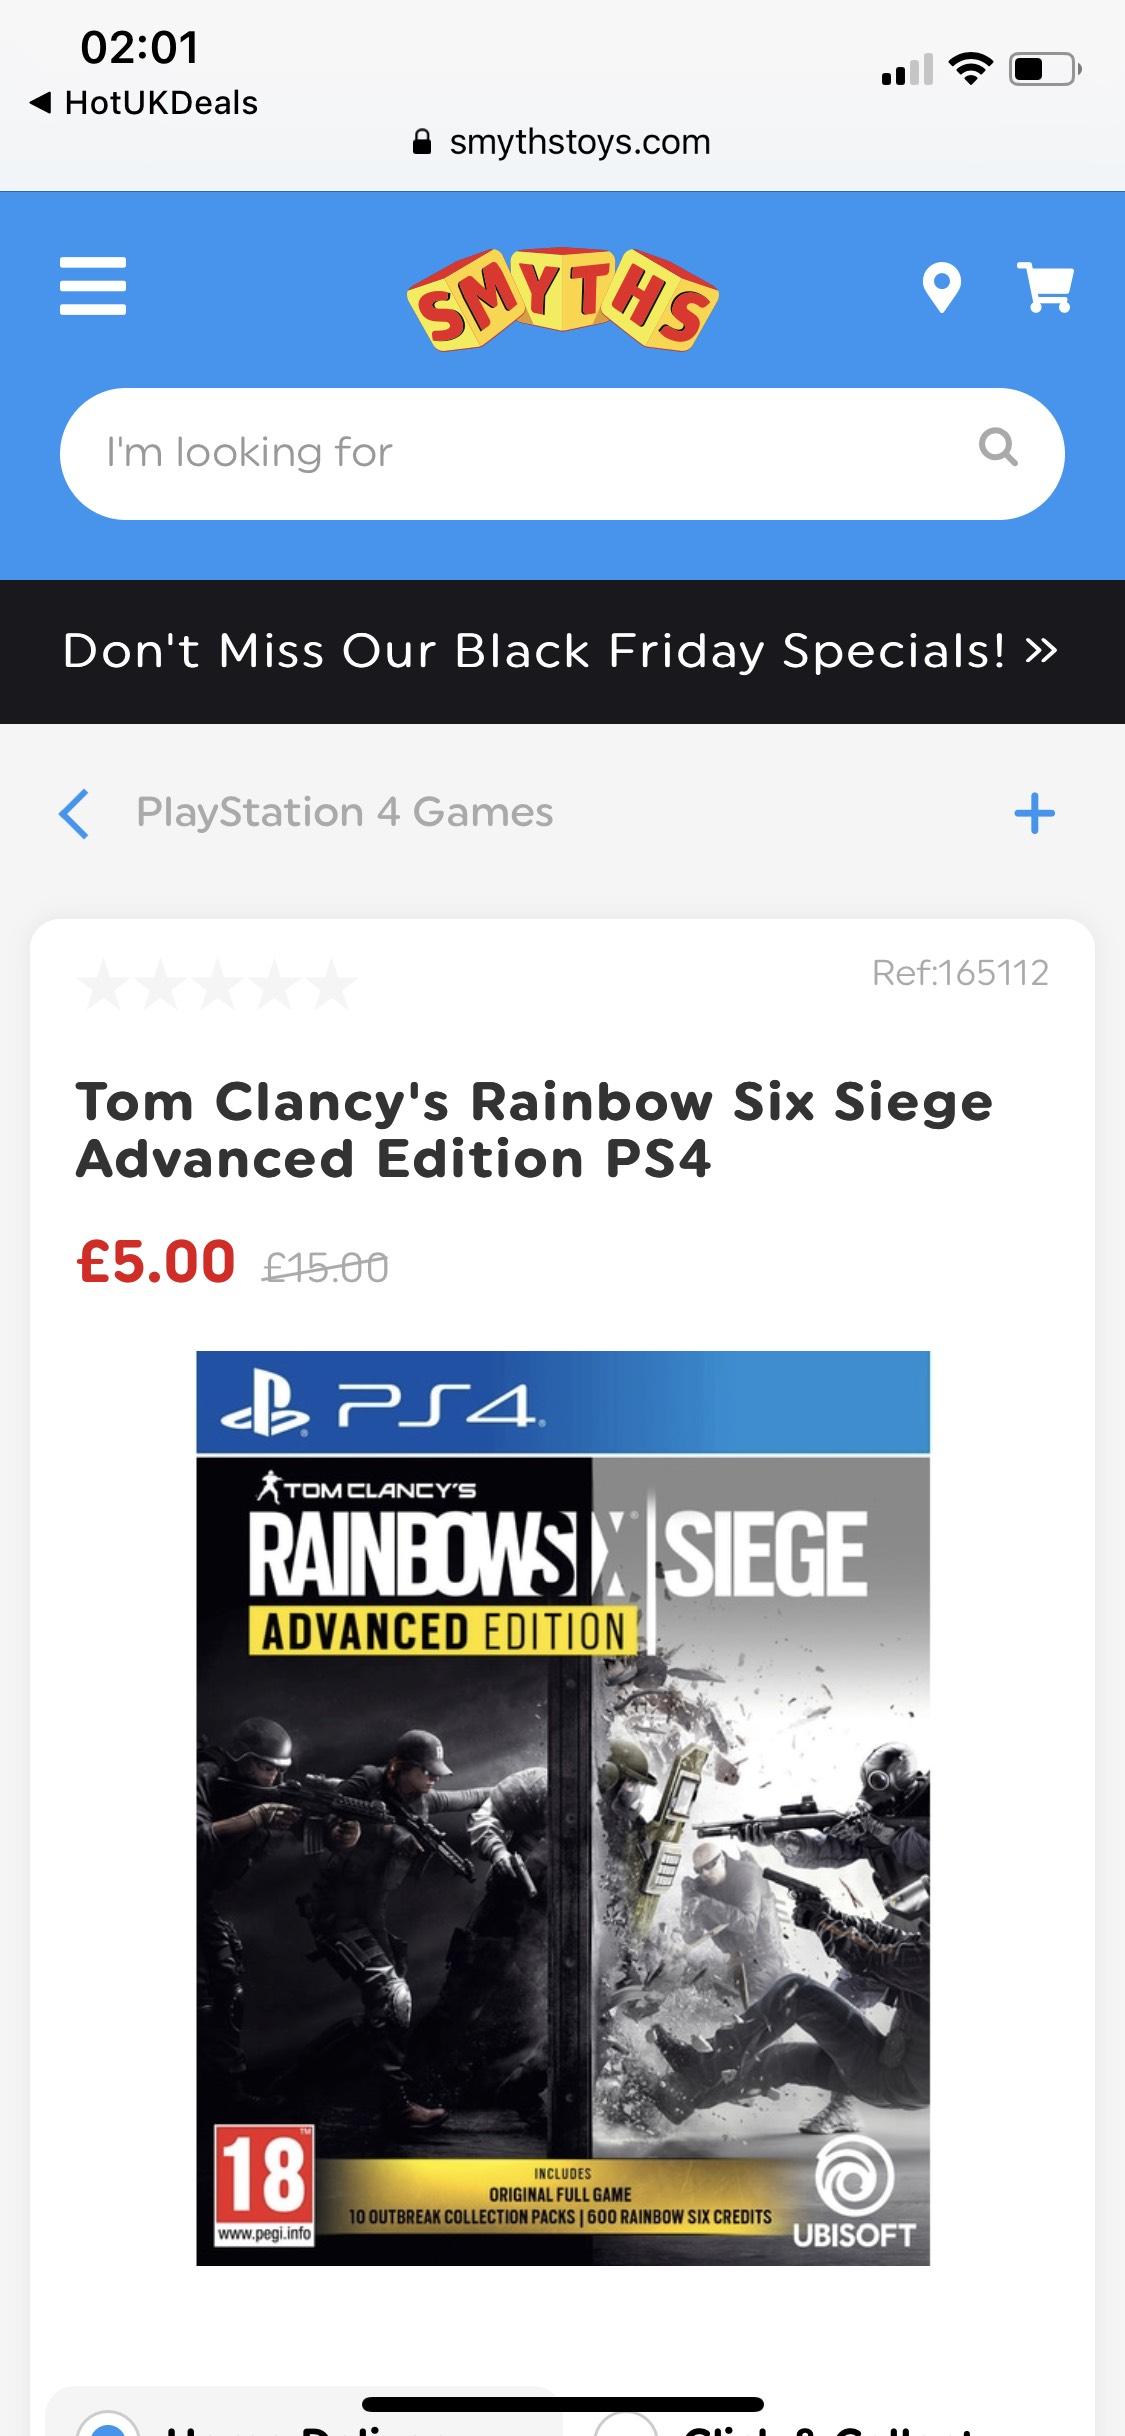 Tom Clancy's Rainbow Six Siege Advanced Edition PS4 £5 Smyths Toys